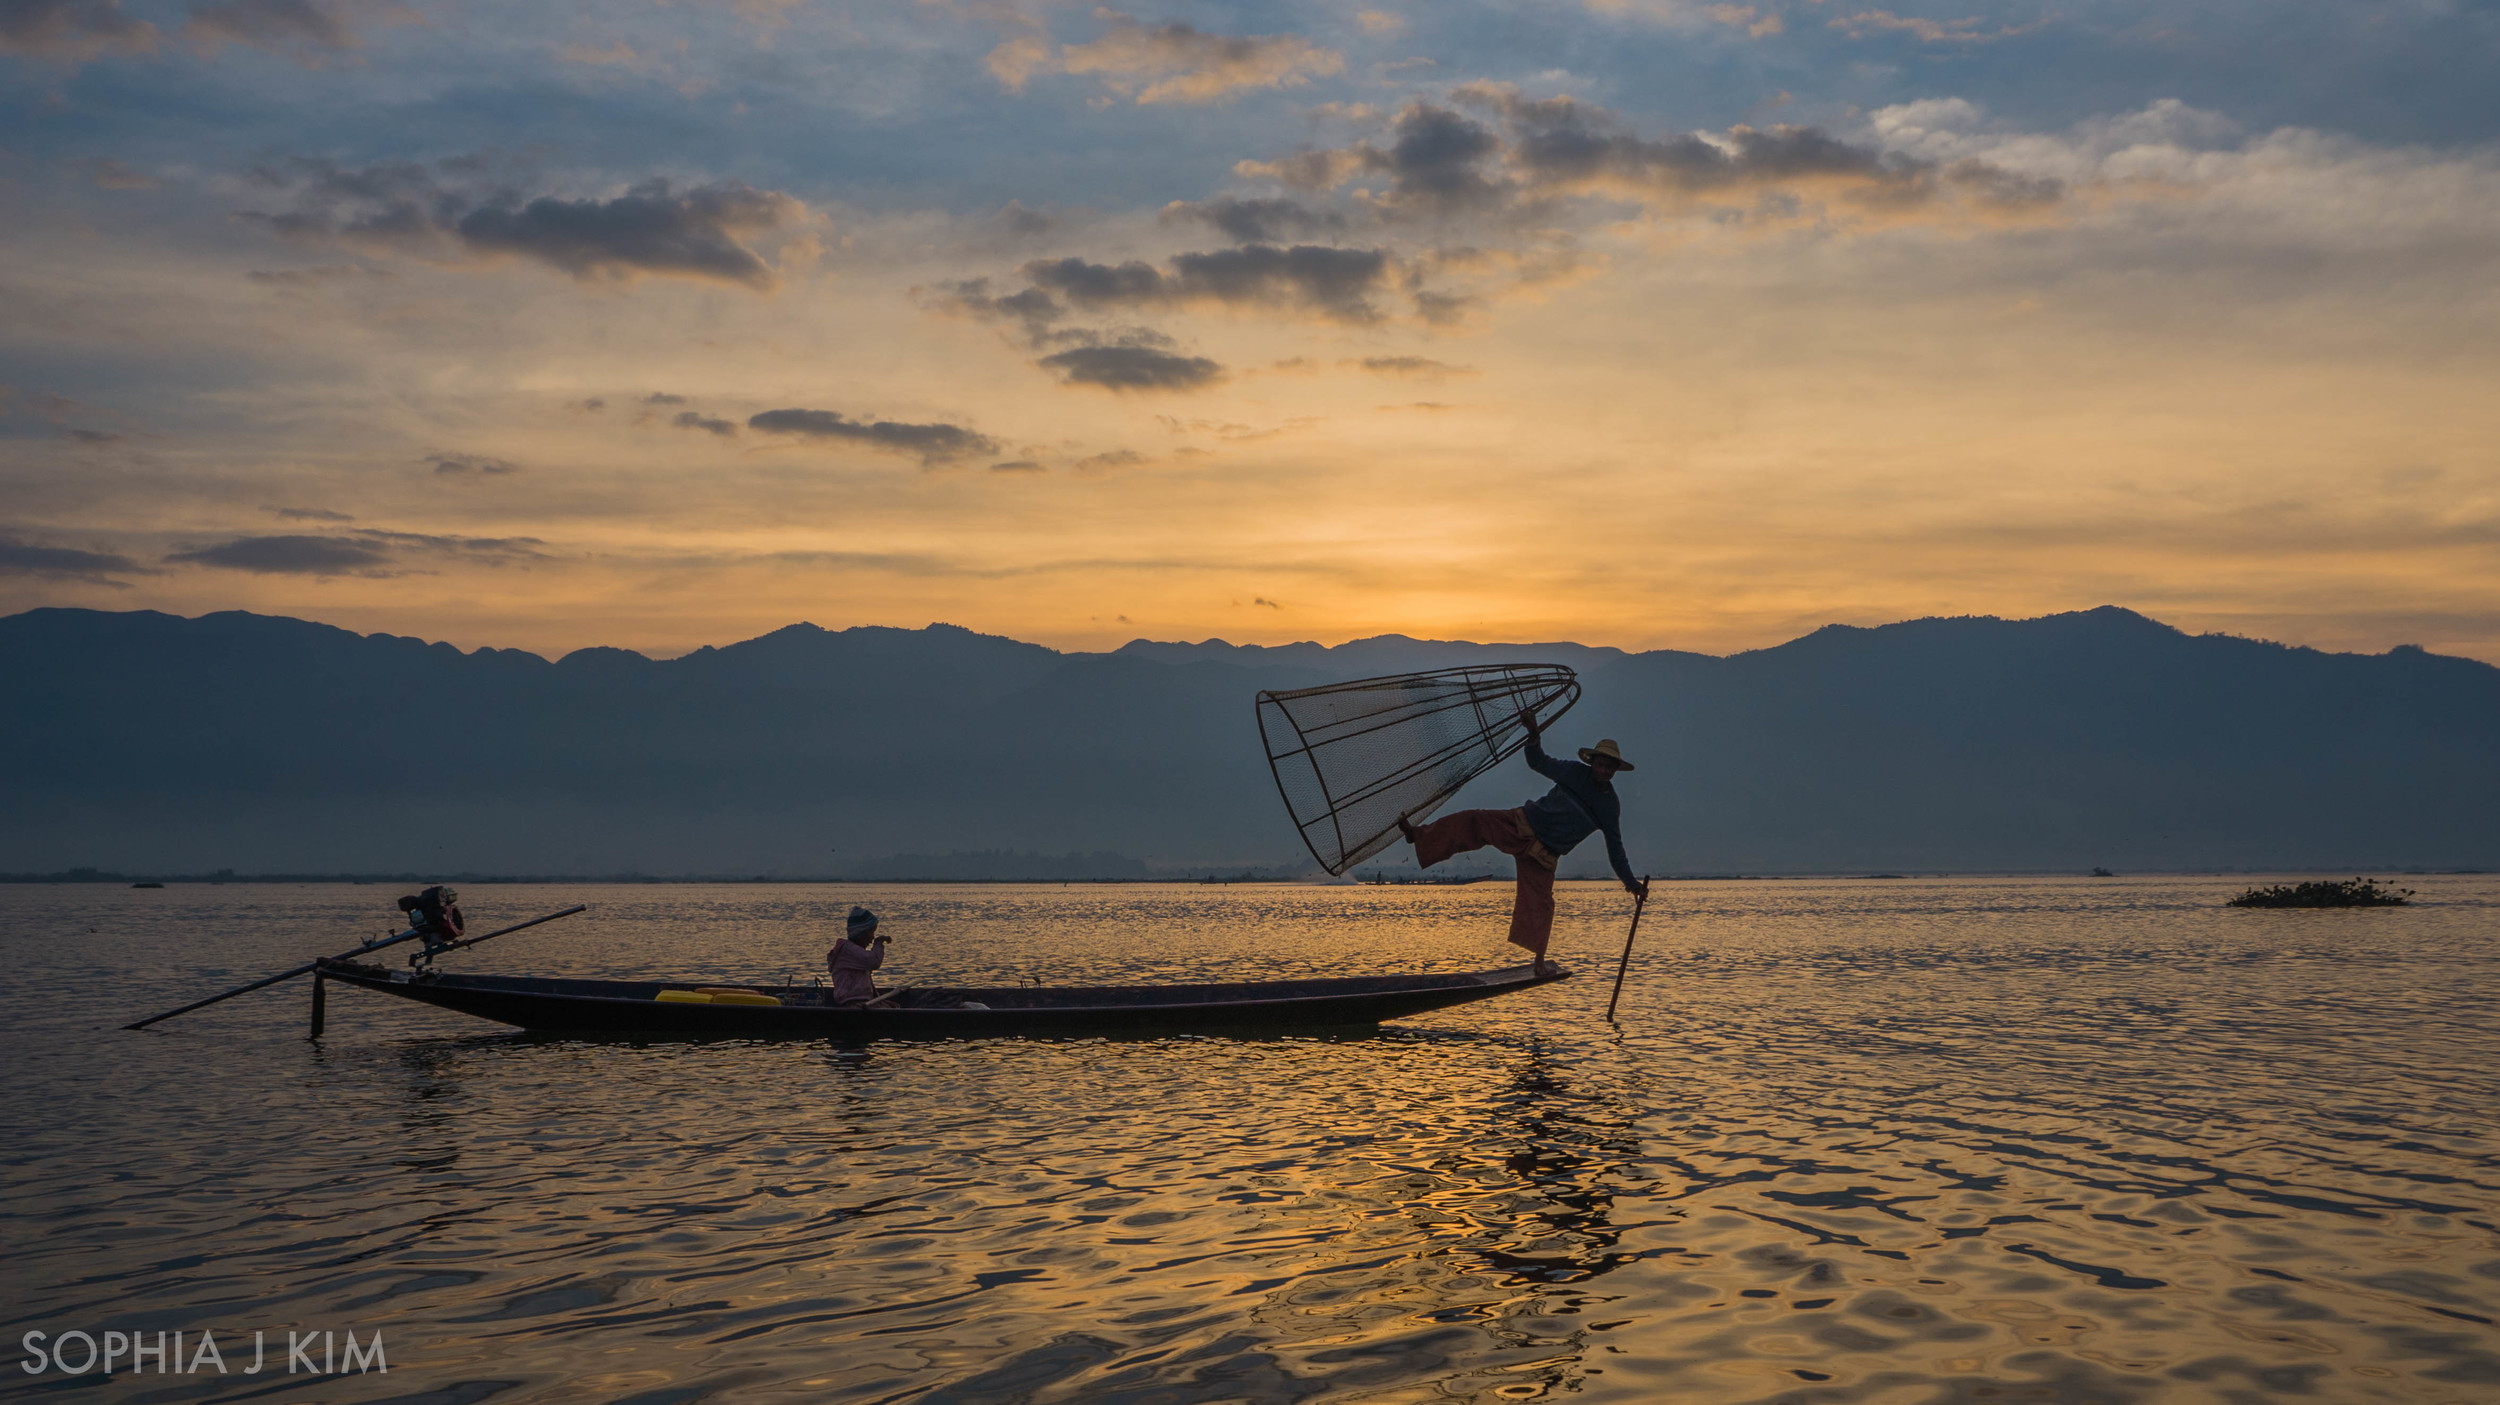 Sunrise at Inle Lake, Myanmar